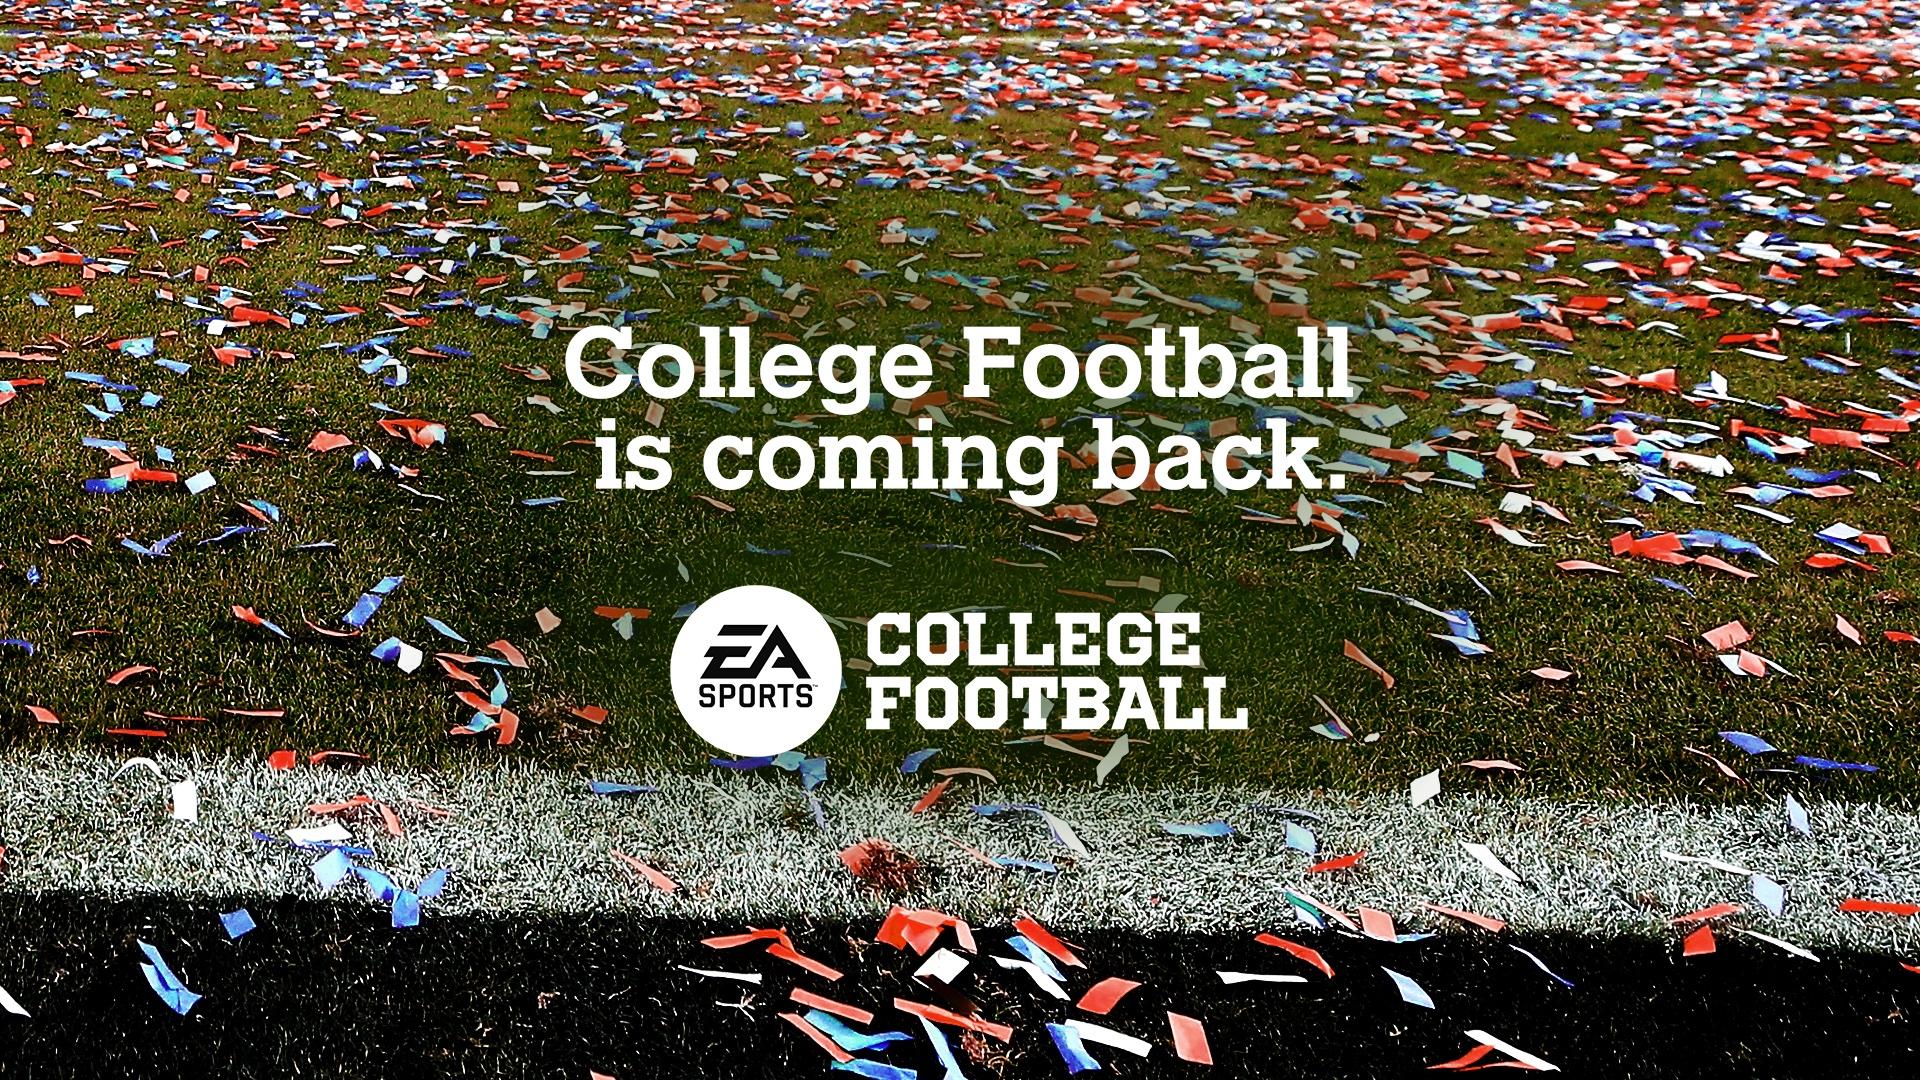 ea-sports-college-football